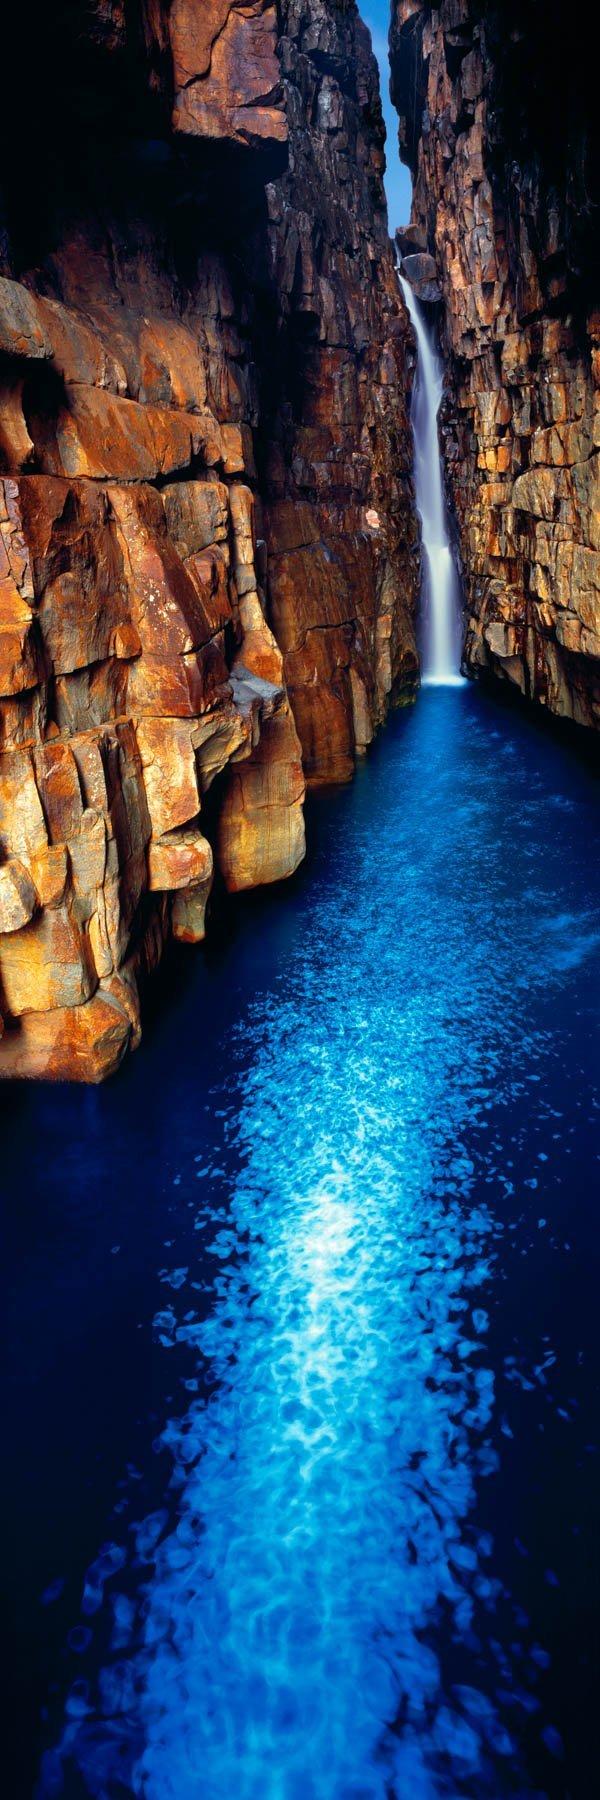 A single waterfall falling down into a Sapphire Pool, Kimberleys, WA, Australia.